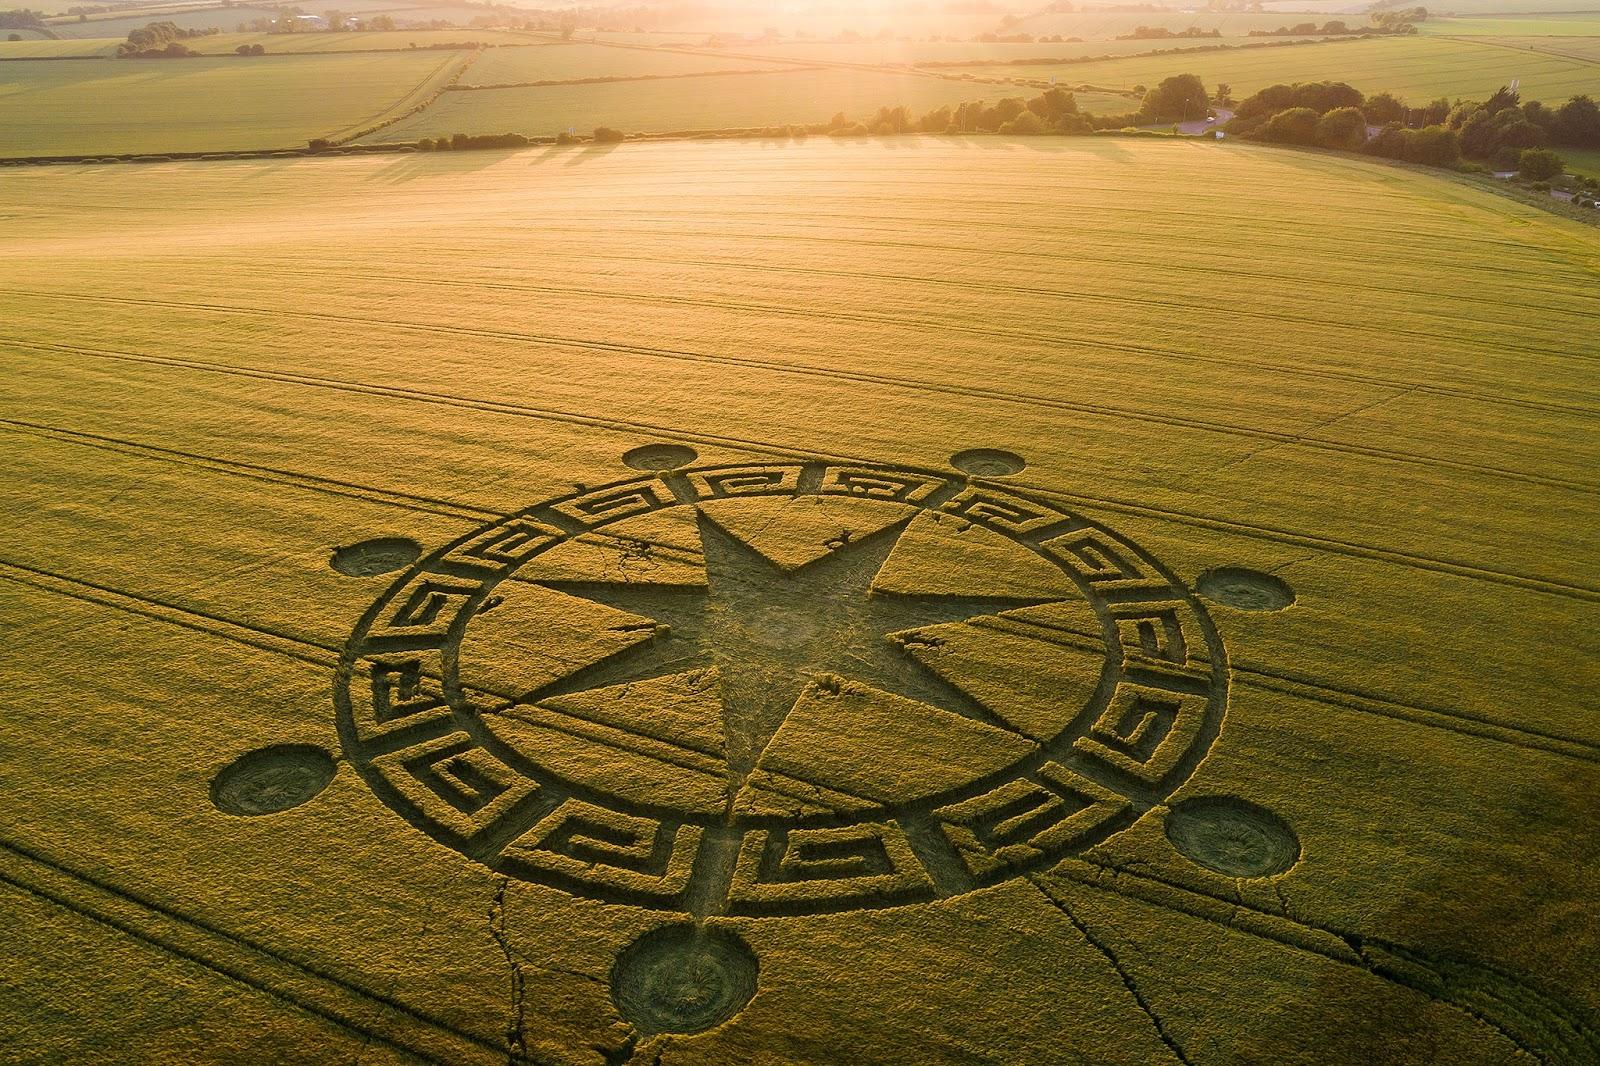 England's crop circle mystery